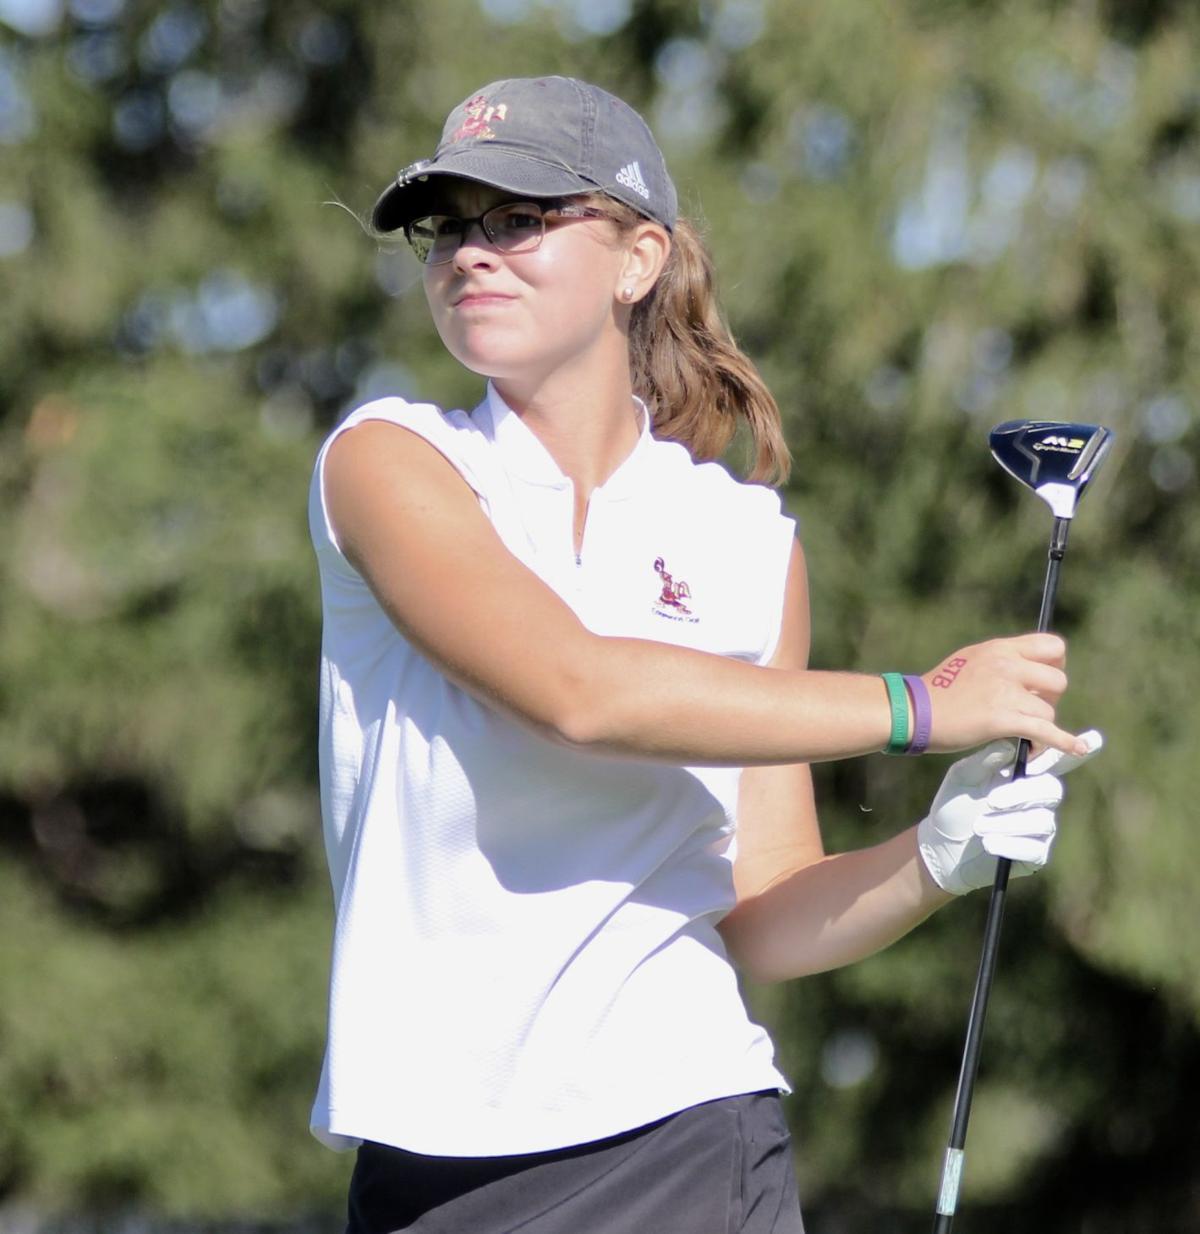 2019 WIAA D2 Girls Golf Sectional | Grace Welch, Madison Edgewood